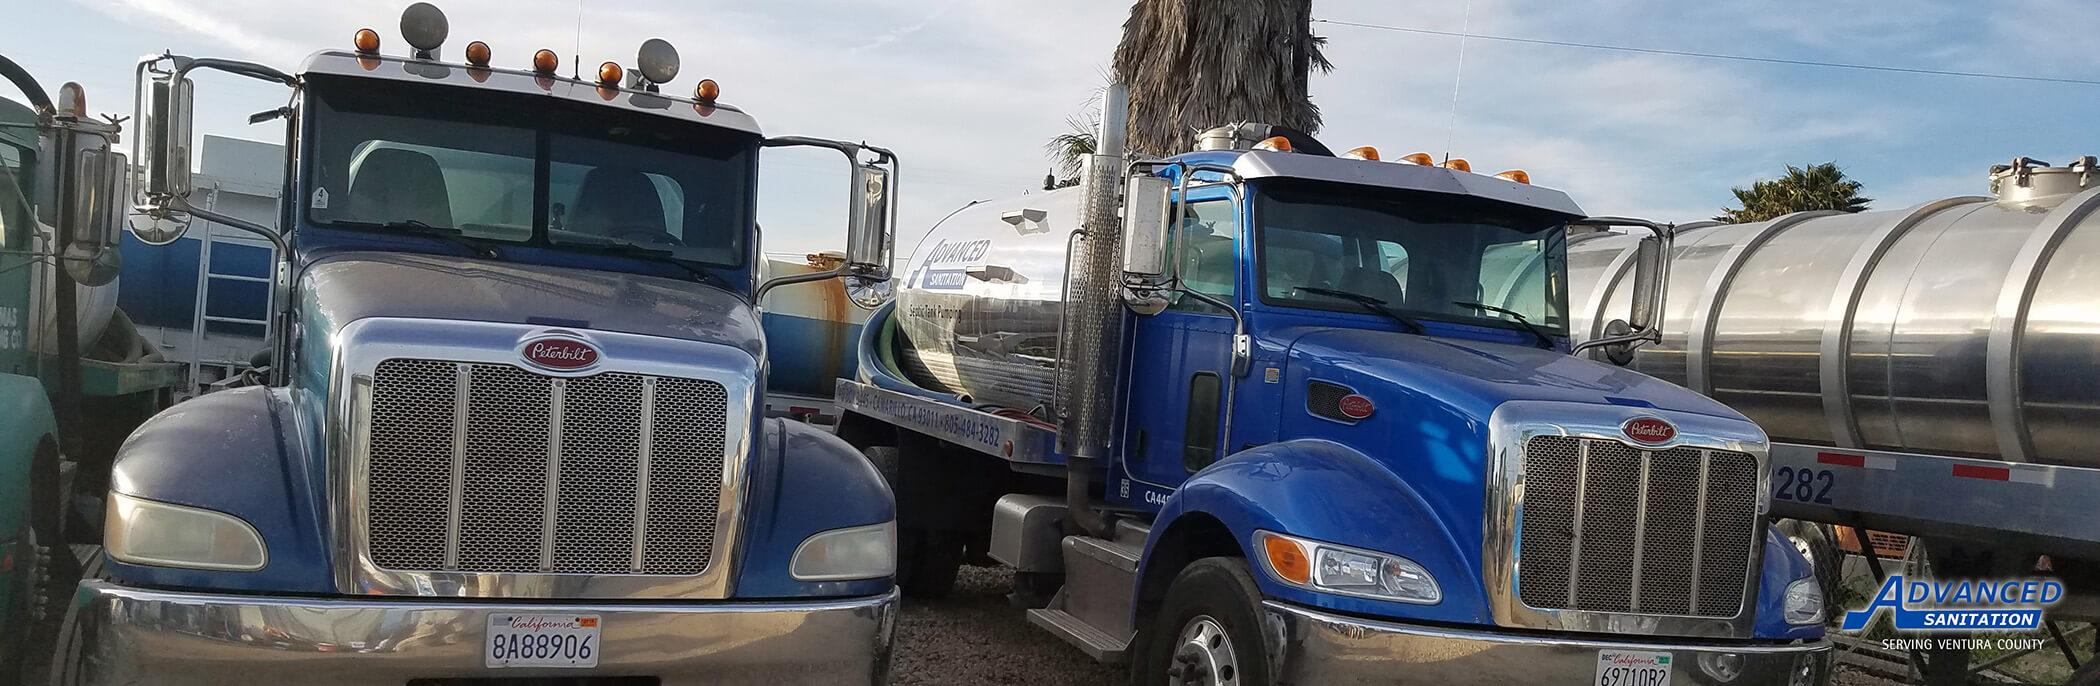 Ventura County Septic Pumping | Advanced Sanitation